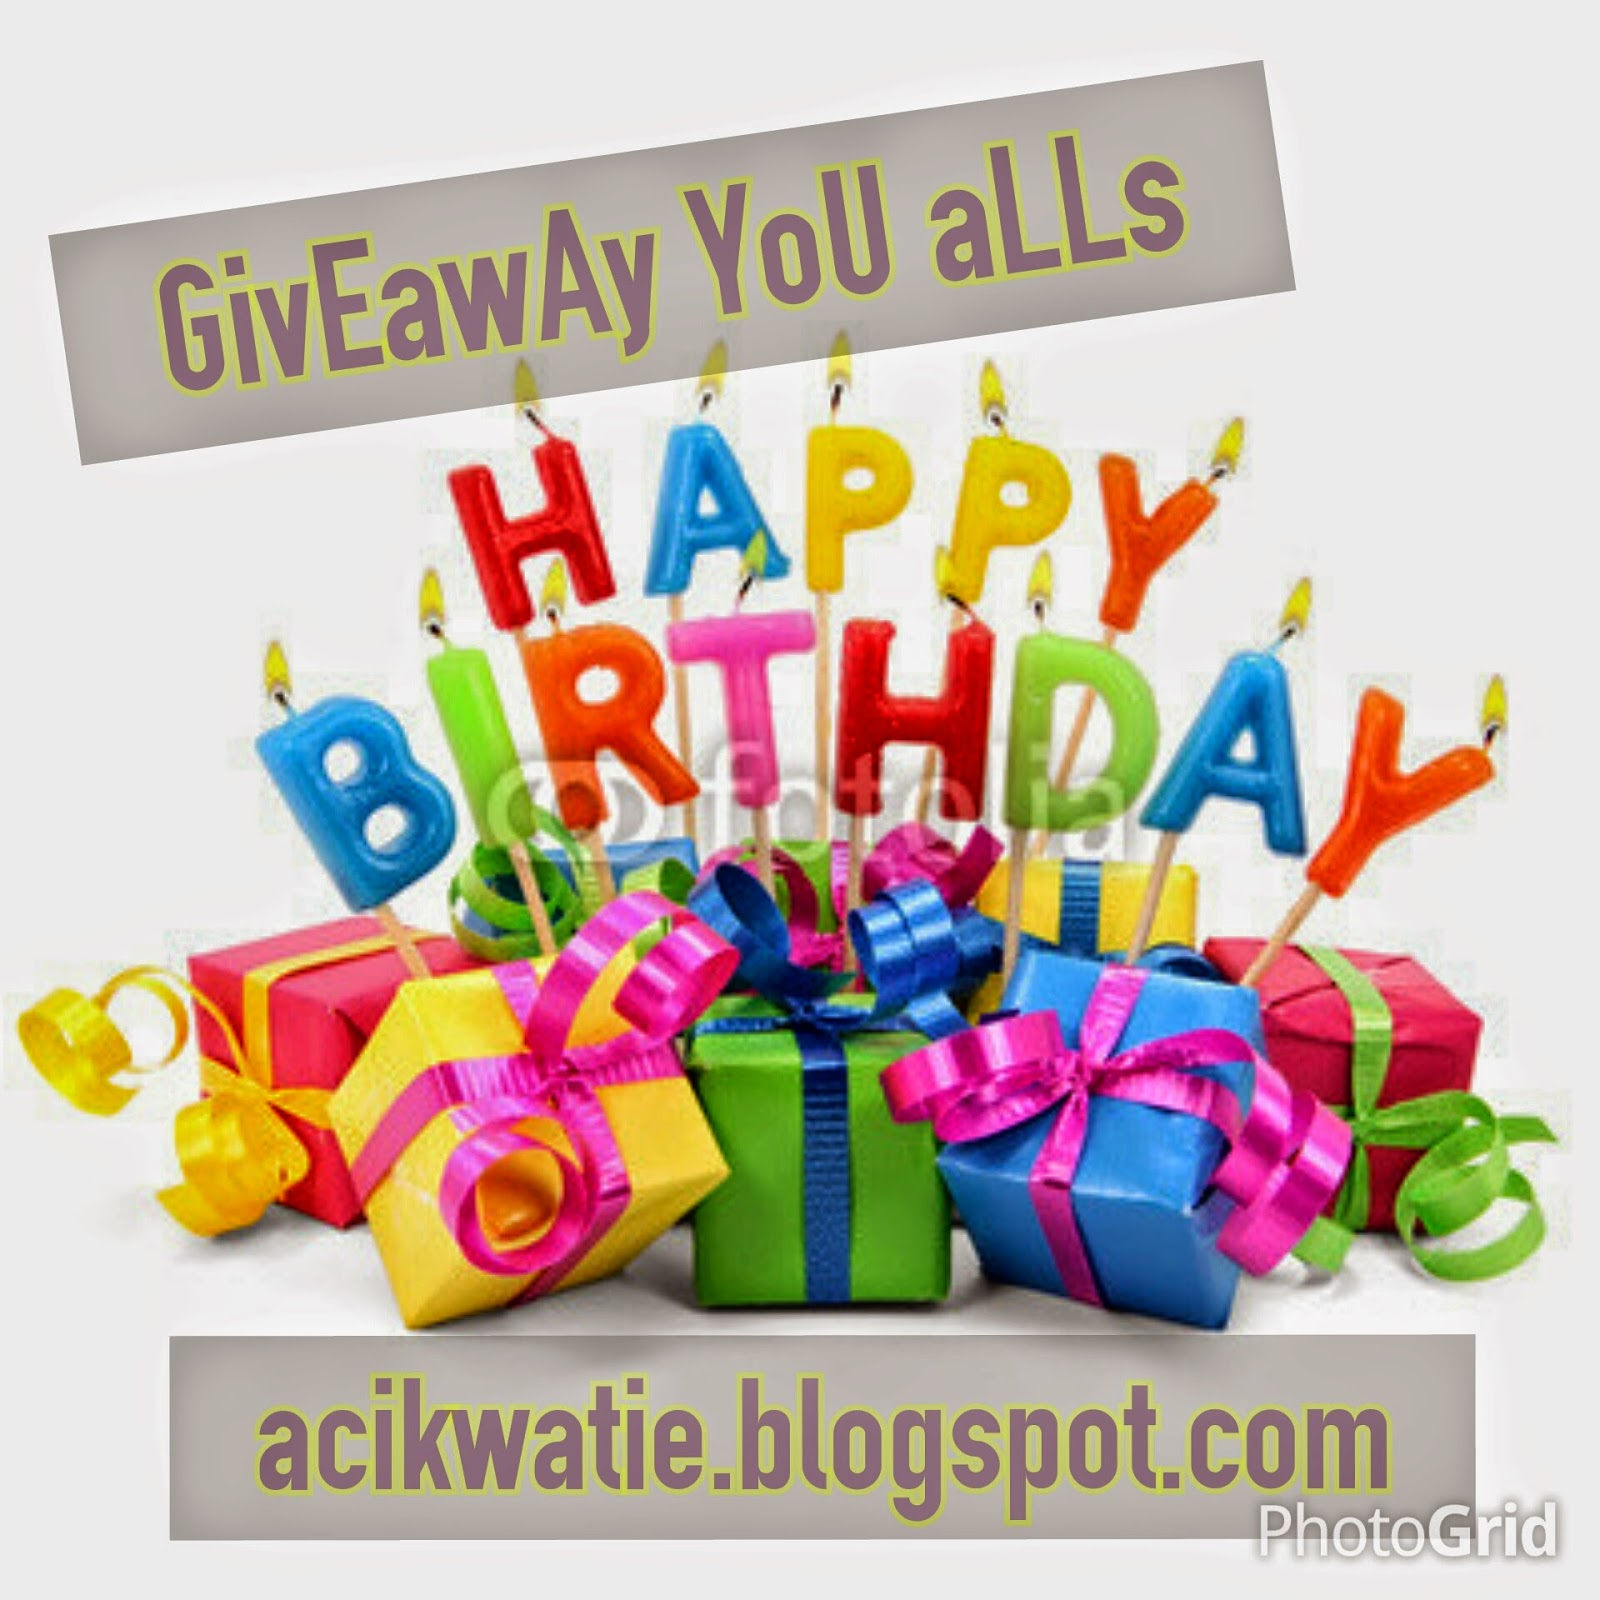 http://acikwatie.blogspot.com/2014/10/giveaway-birthday-you-alls.html